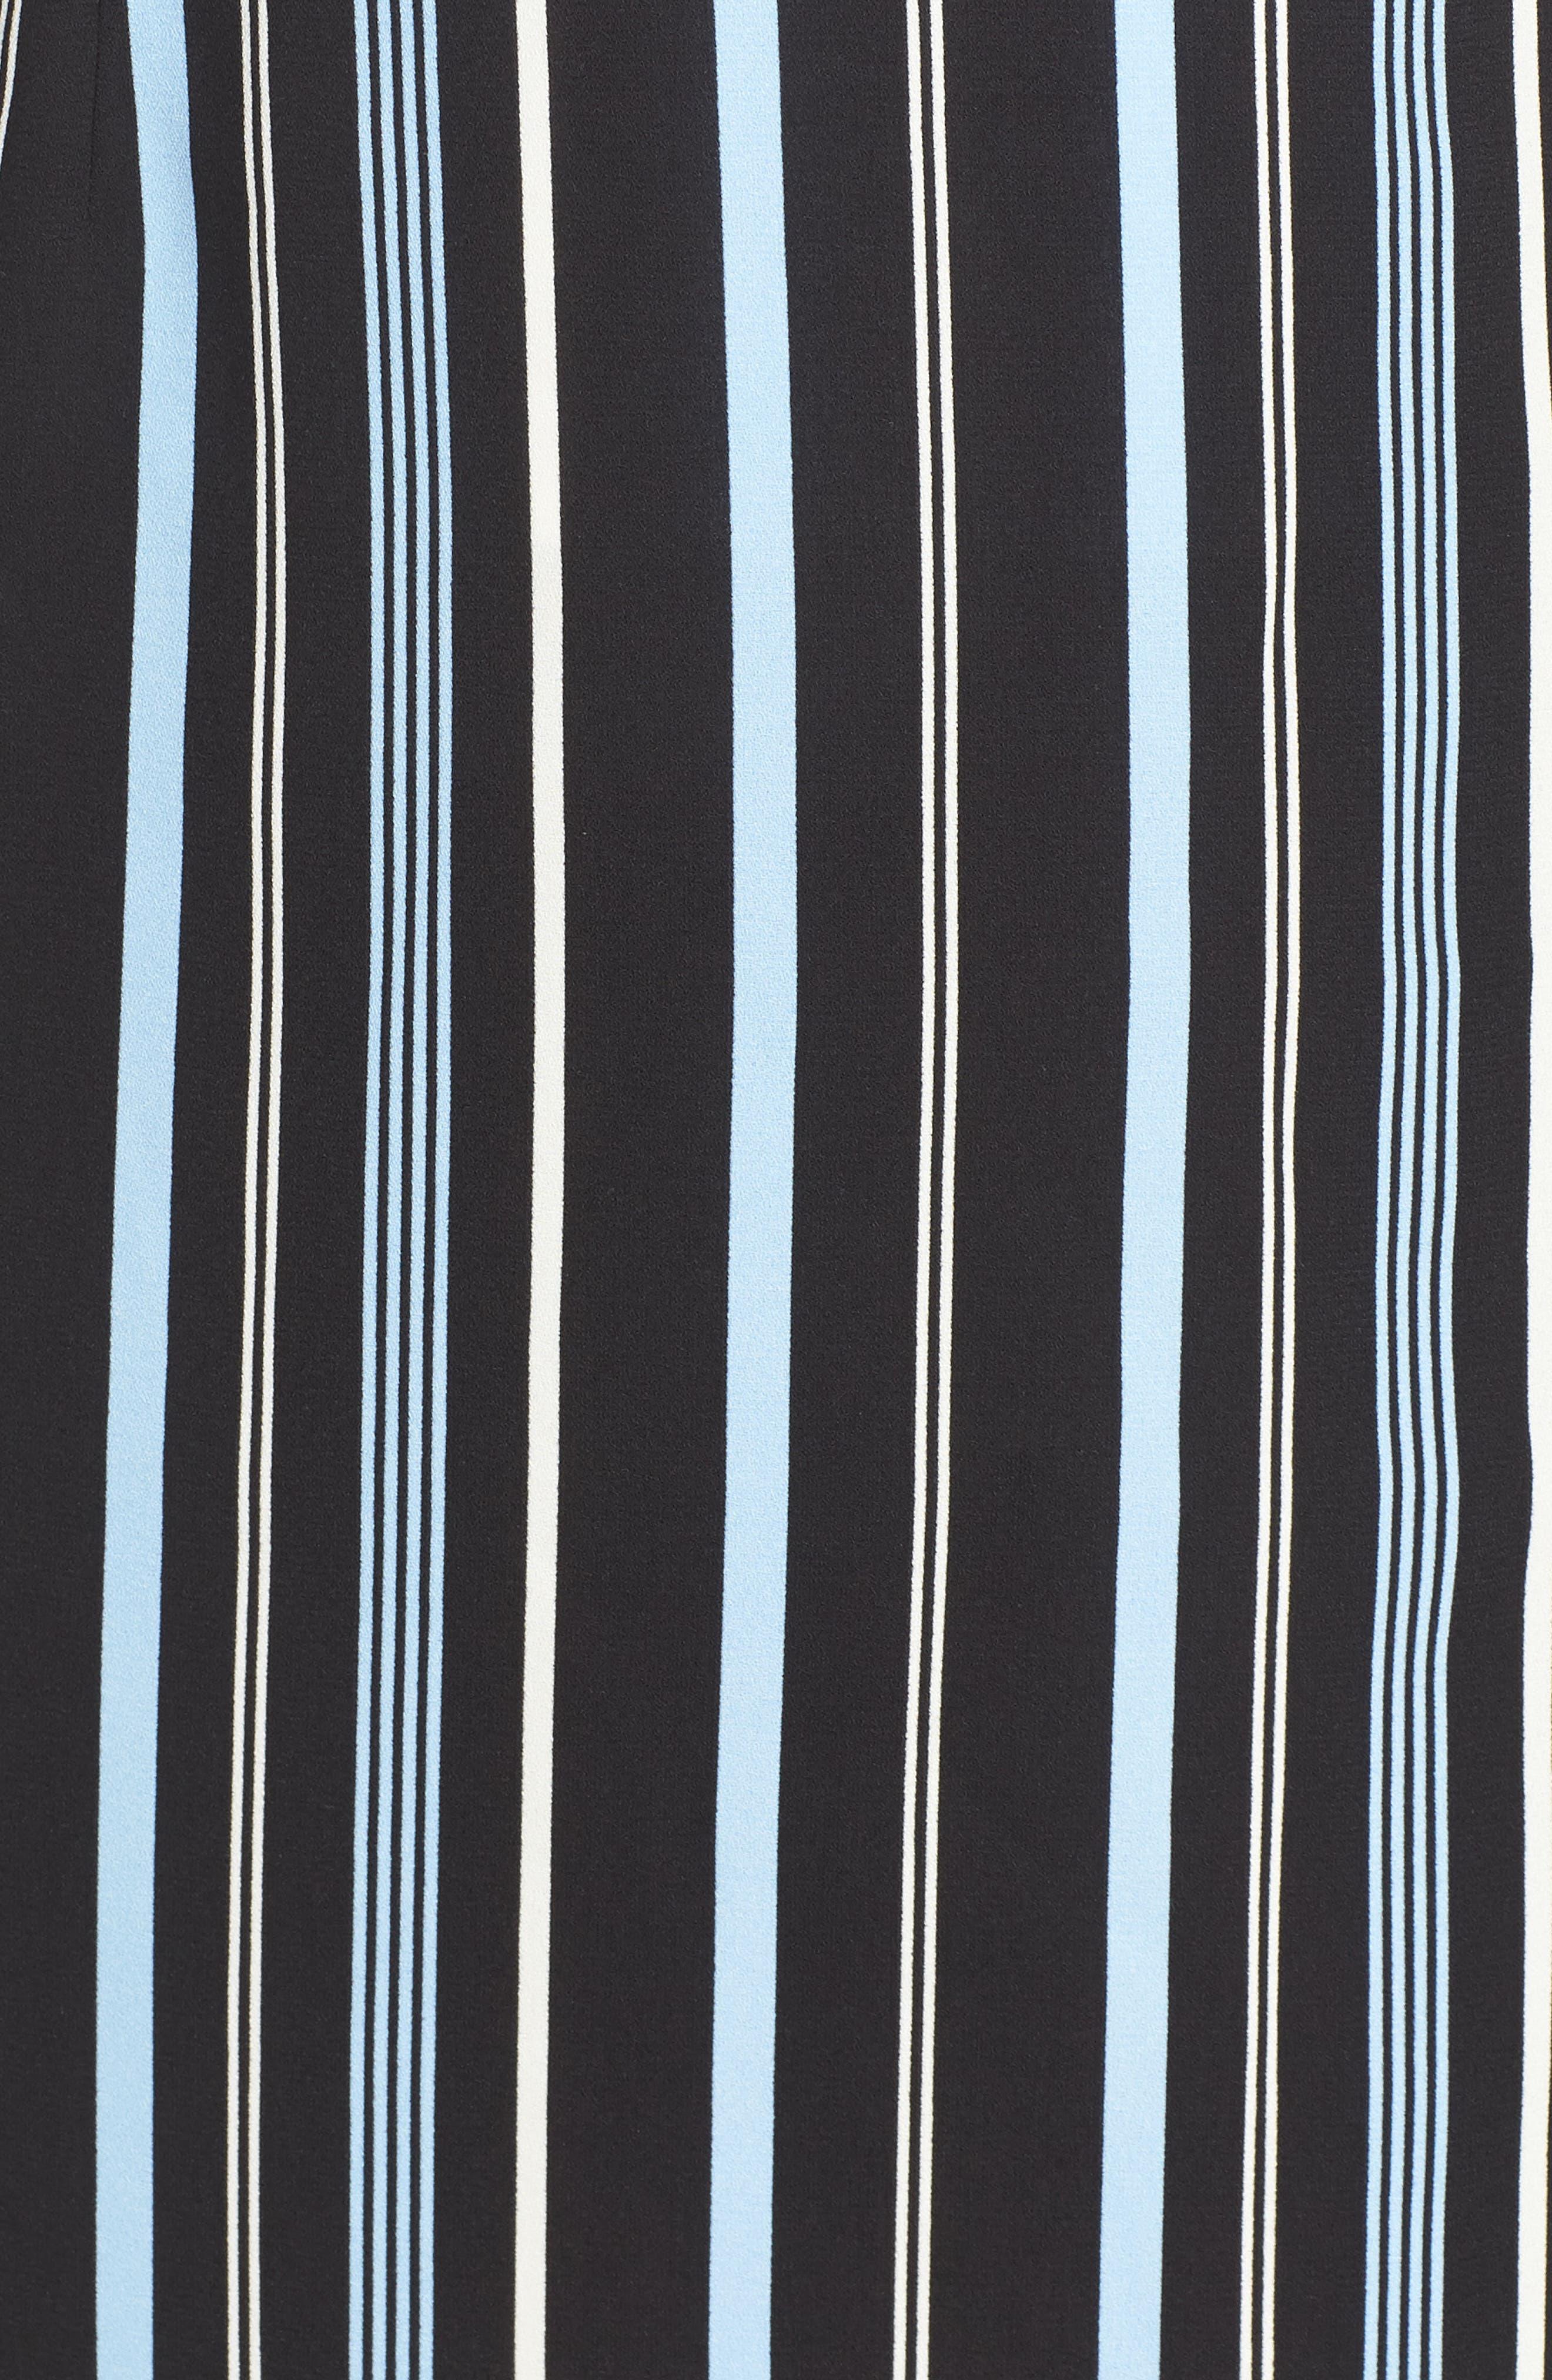 Button Wrap Skirt,                             Alternate thumbnail 11, color,                             BLACK MULTI COLORED STRIPE